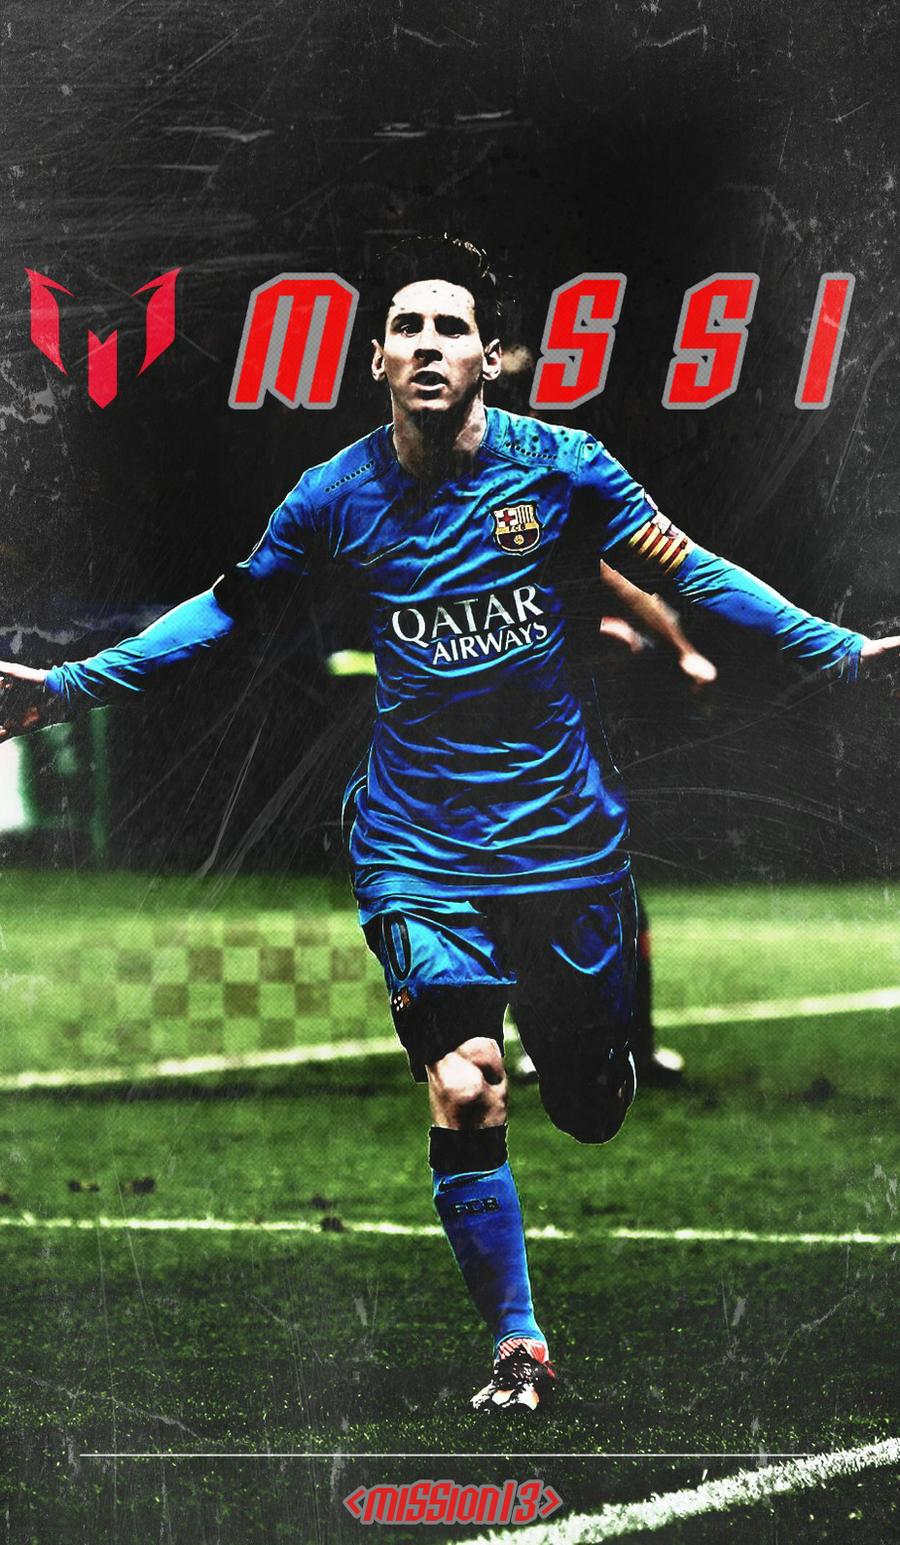 Messi Wallpaper 2017 16 By Sam4saken On Deviantart